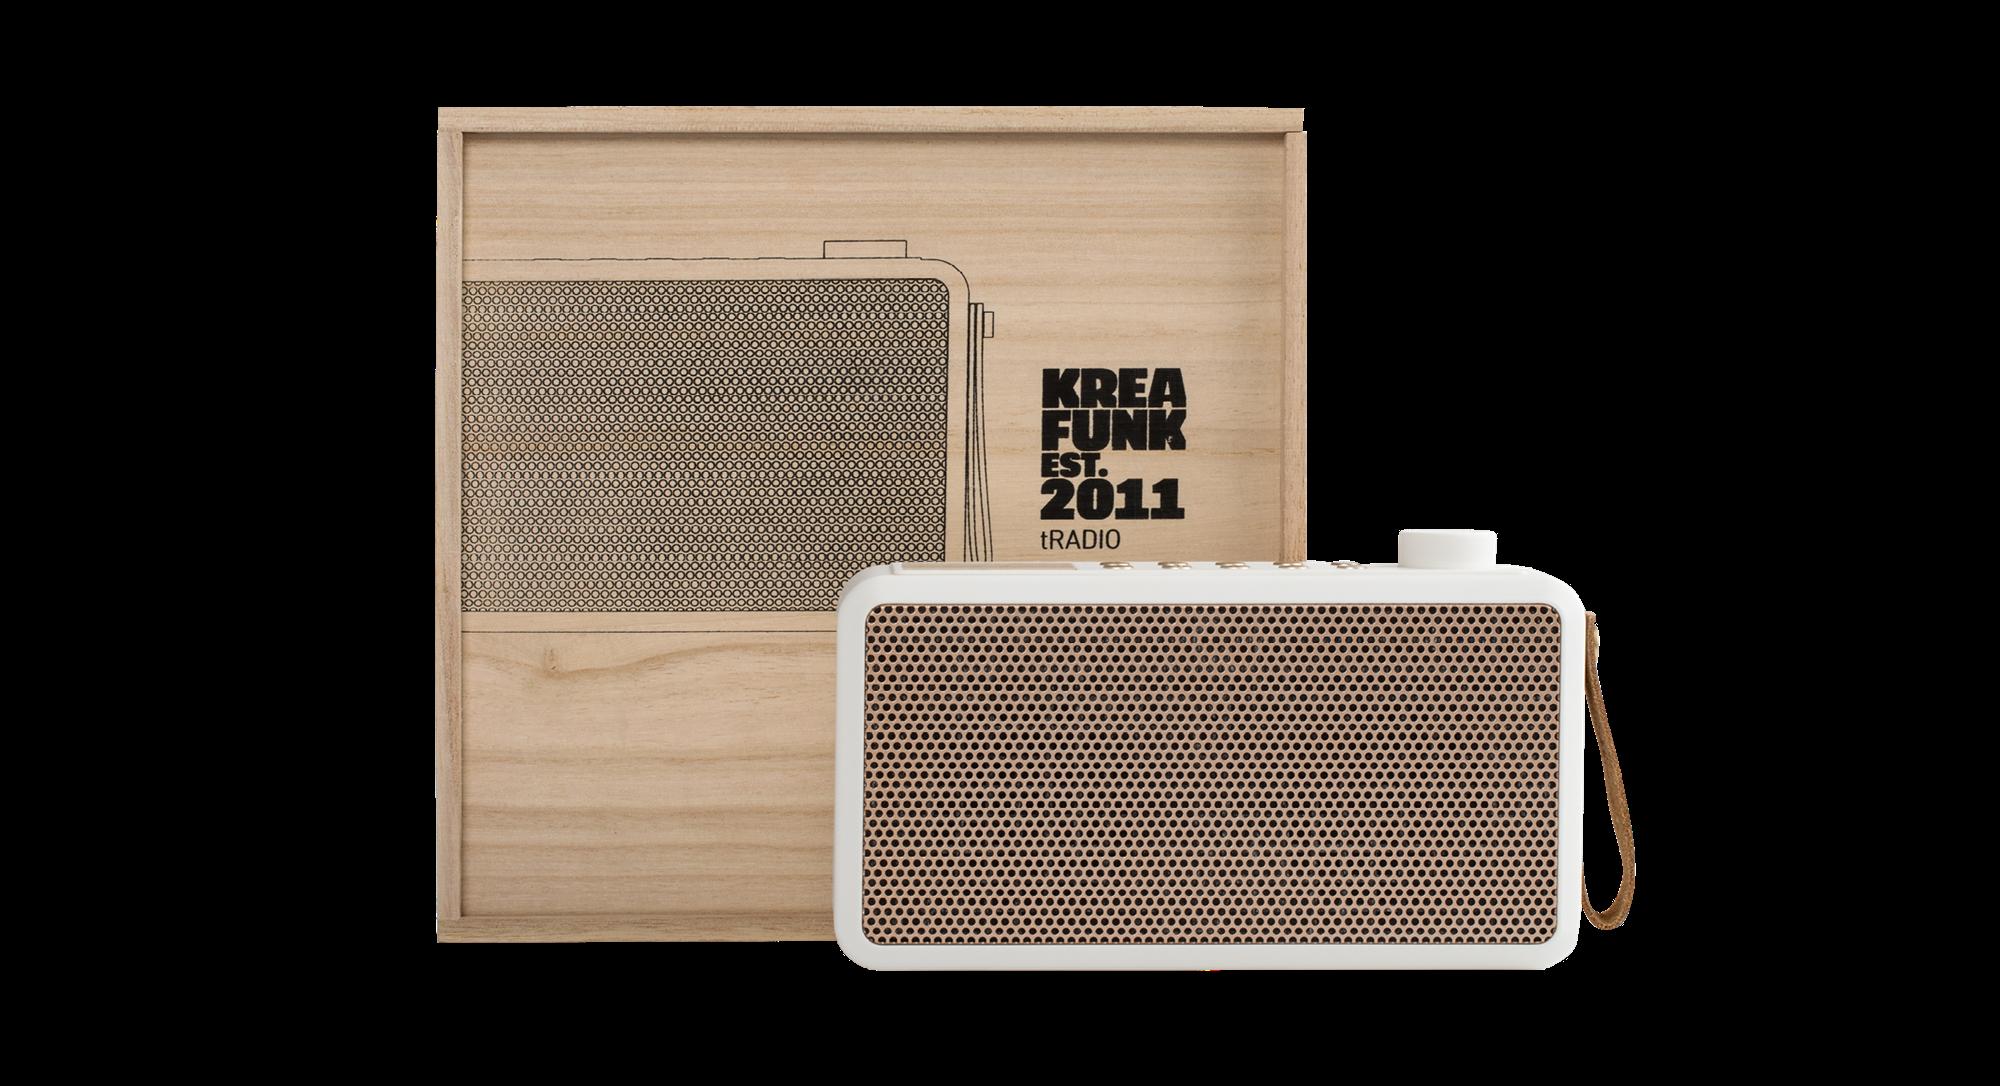 Kreafunk tRADIO, DAB+ radio, white